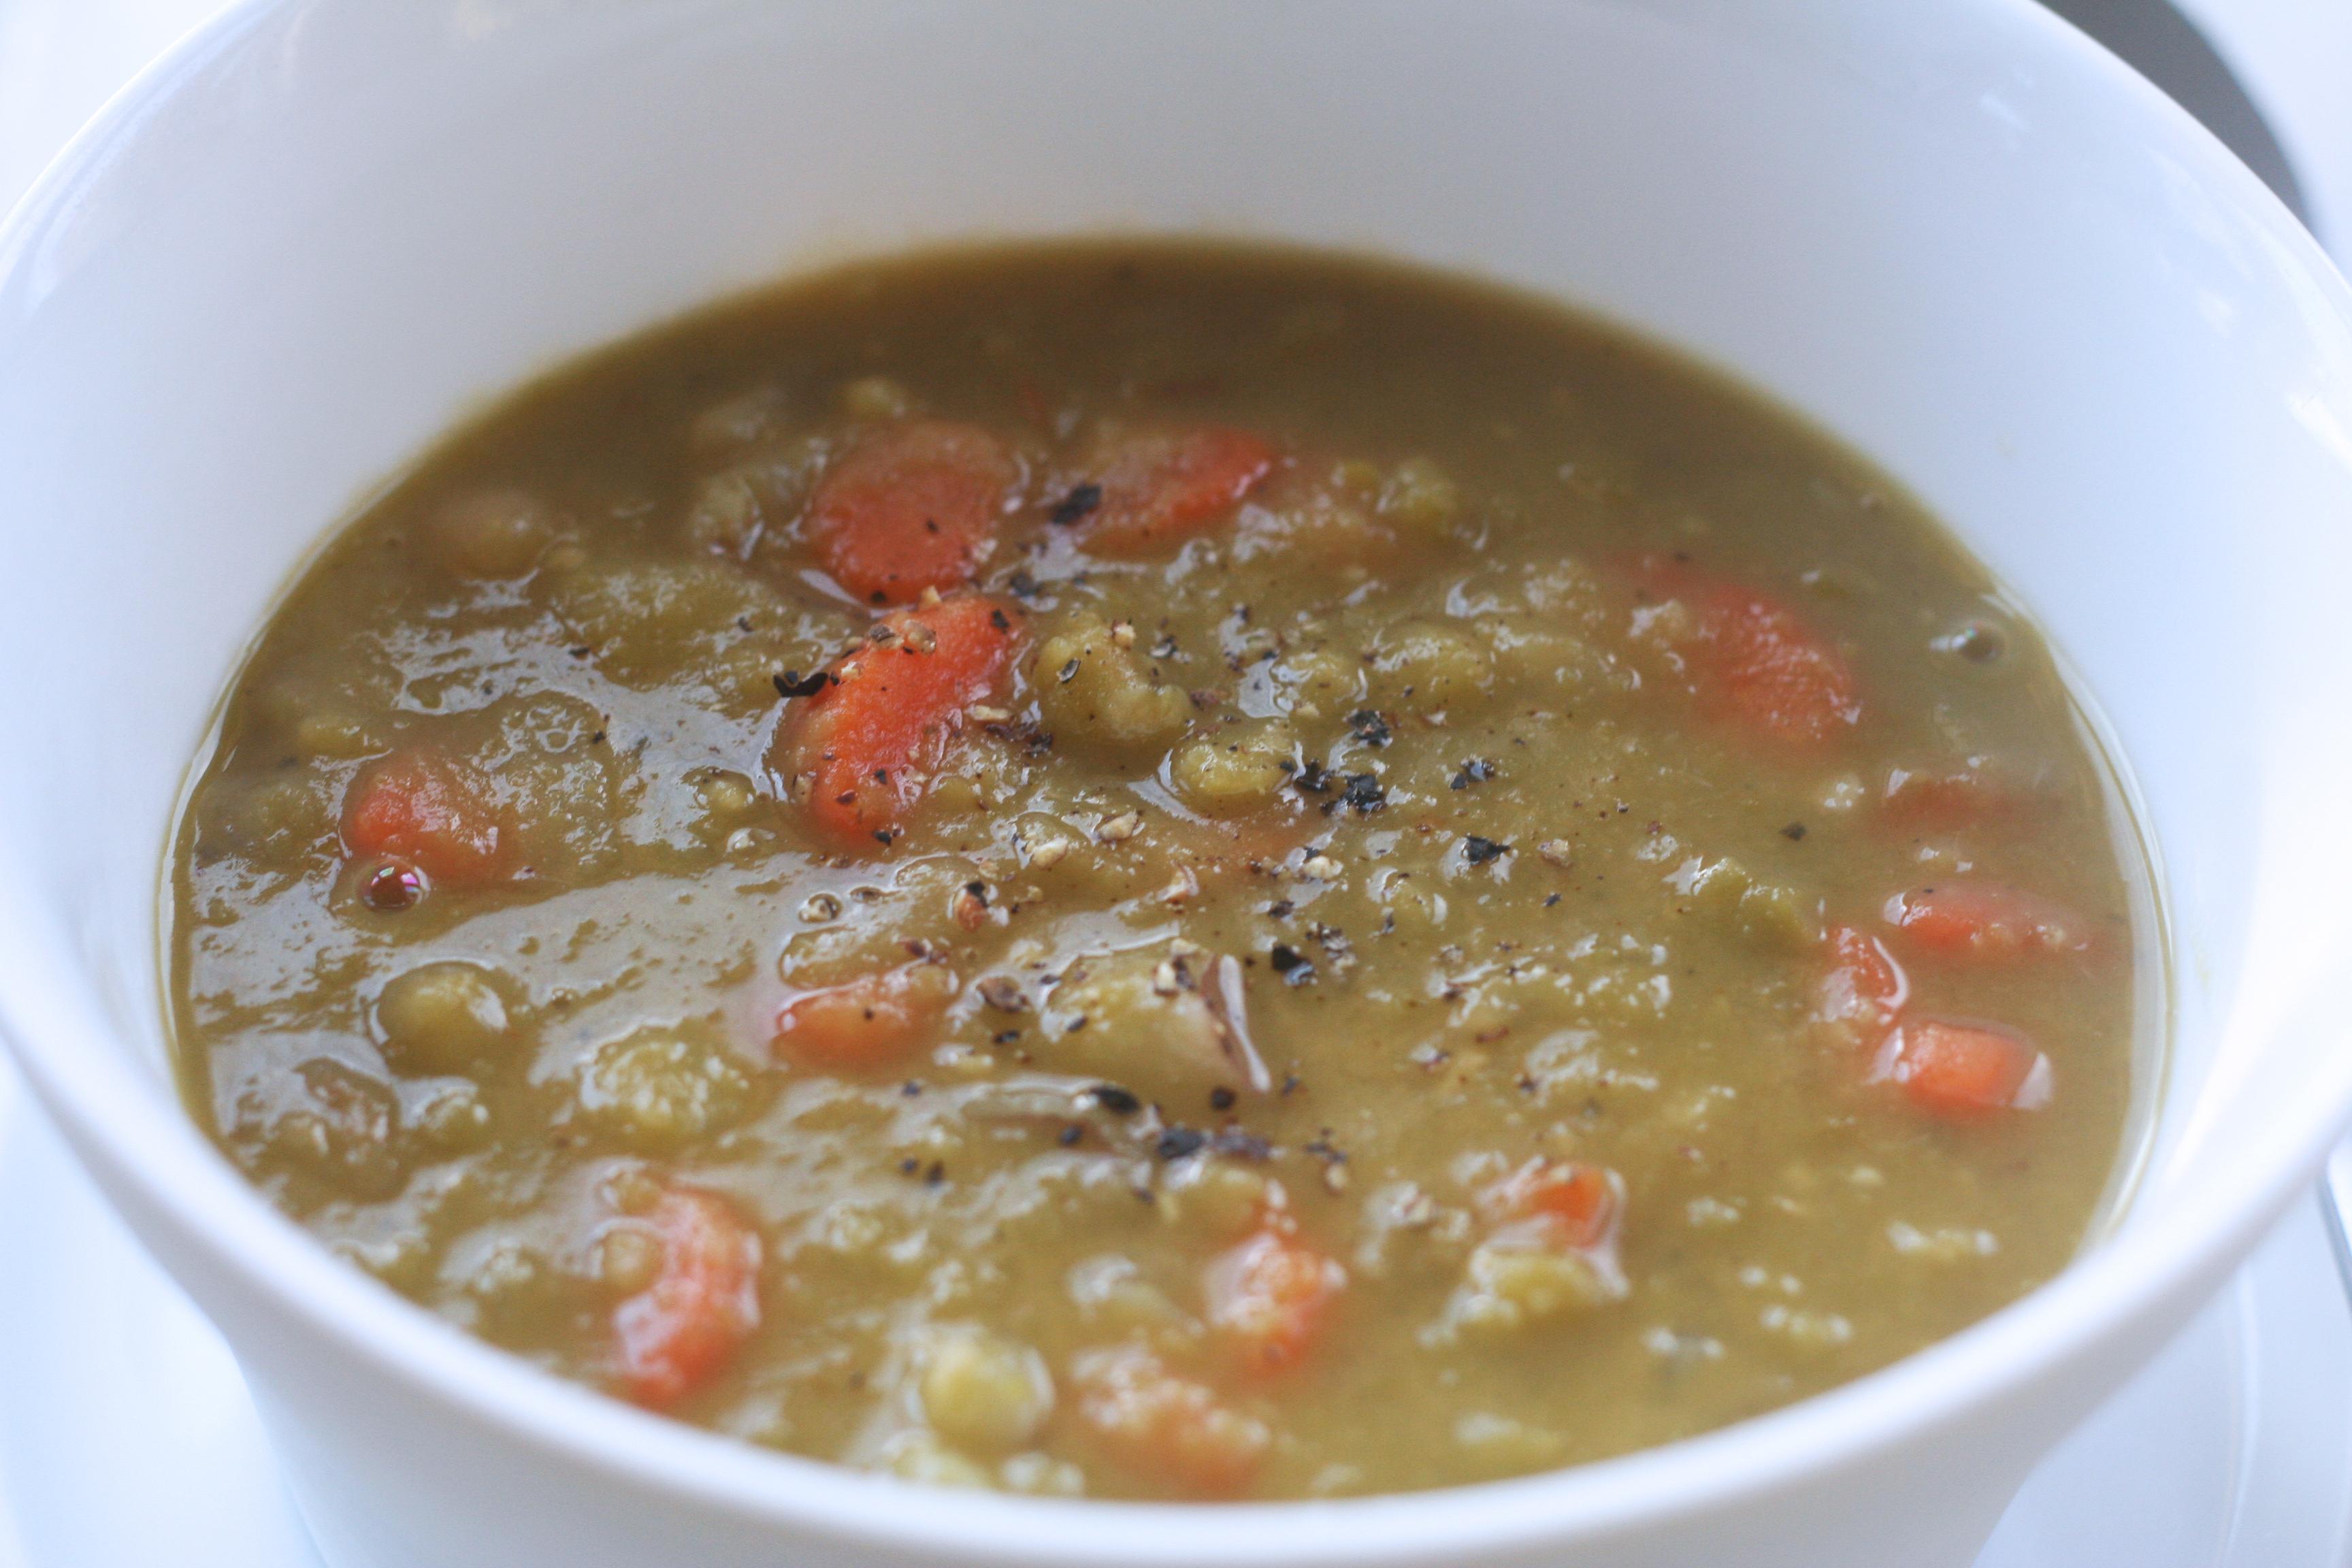 Ina Garten Meatloaf barefoot contessa's split pea soup – give me meatloaf